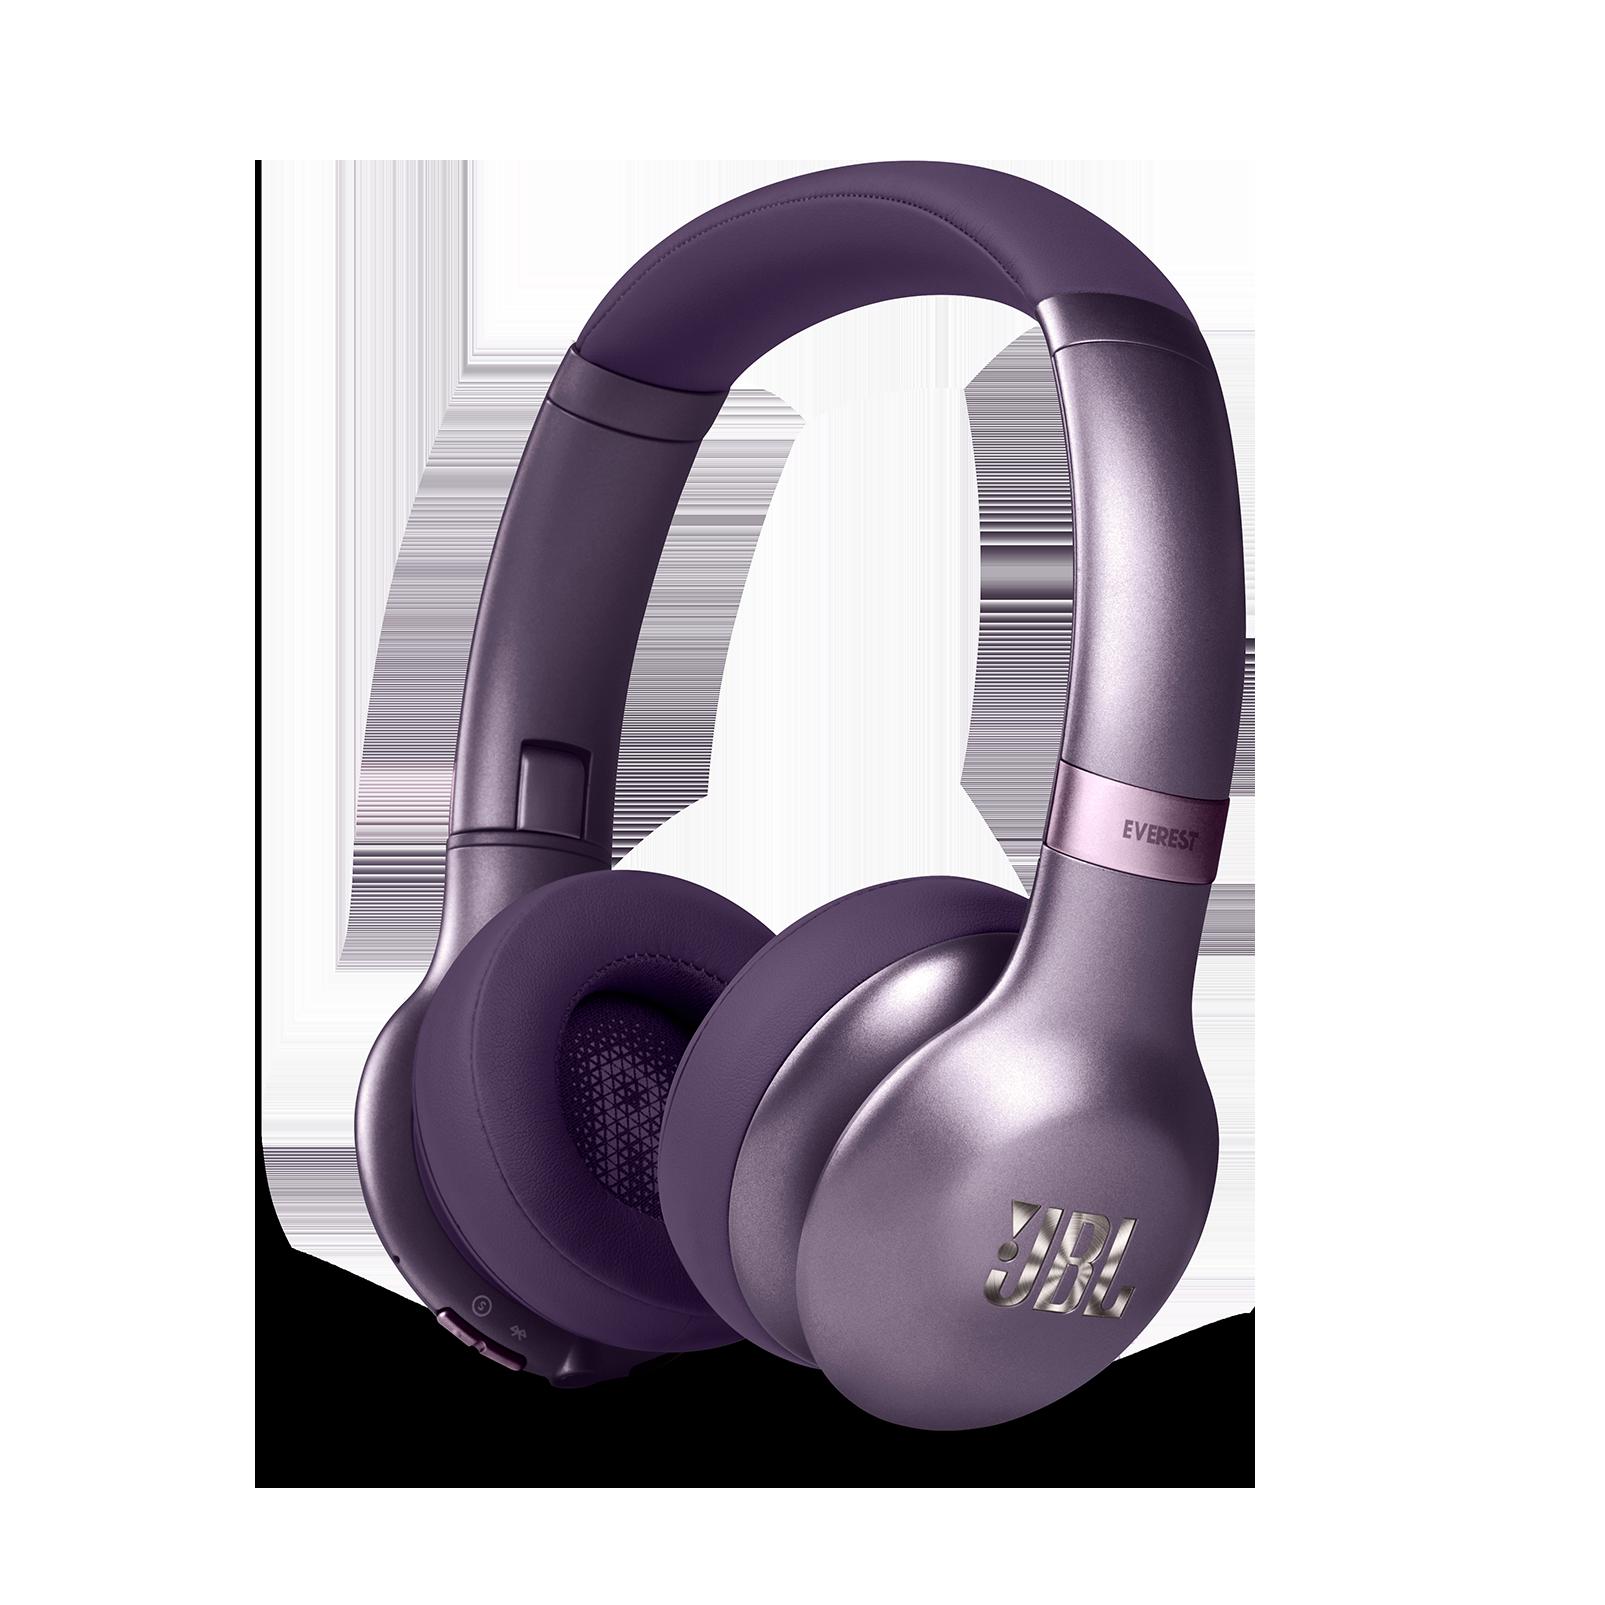 JBL JBLV310BTPUR Everest 310 On-Ear Wireless Bluetooth Headphones with Microphone Purple by JBL